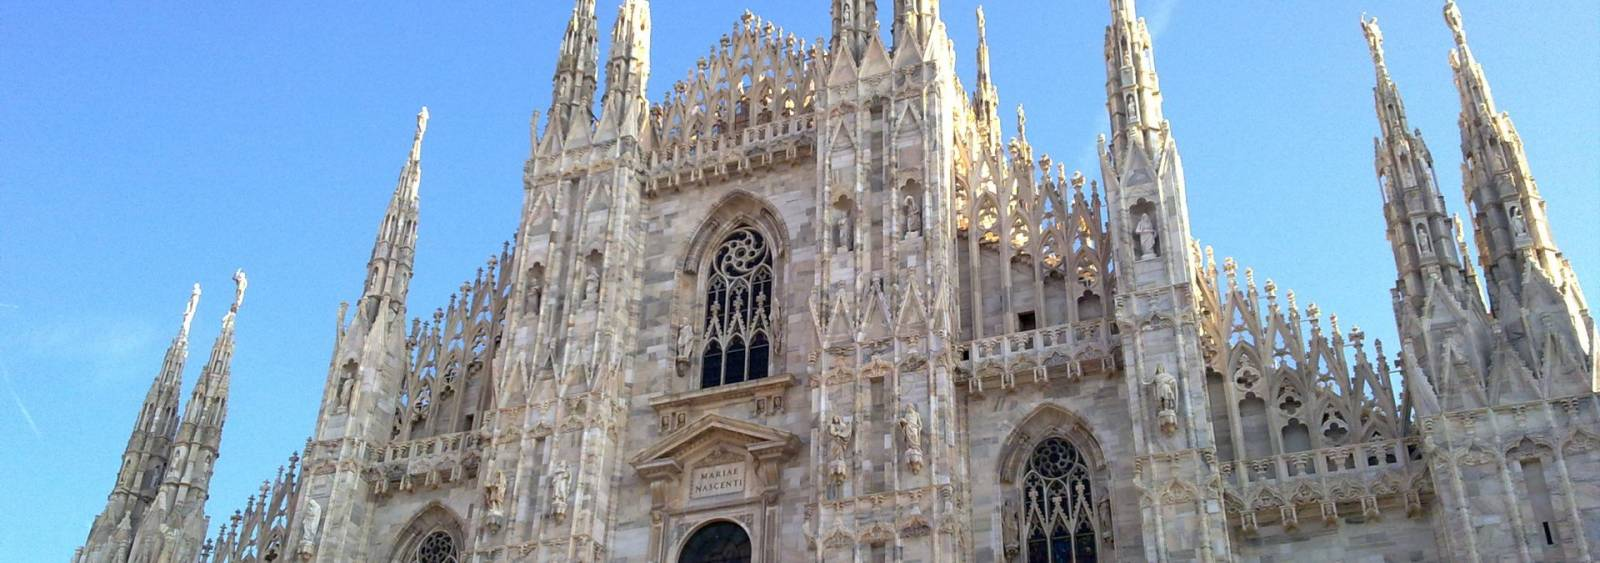 Slider_-Klinger_Italy_Milano_Duomo1